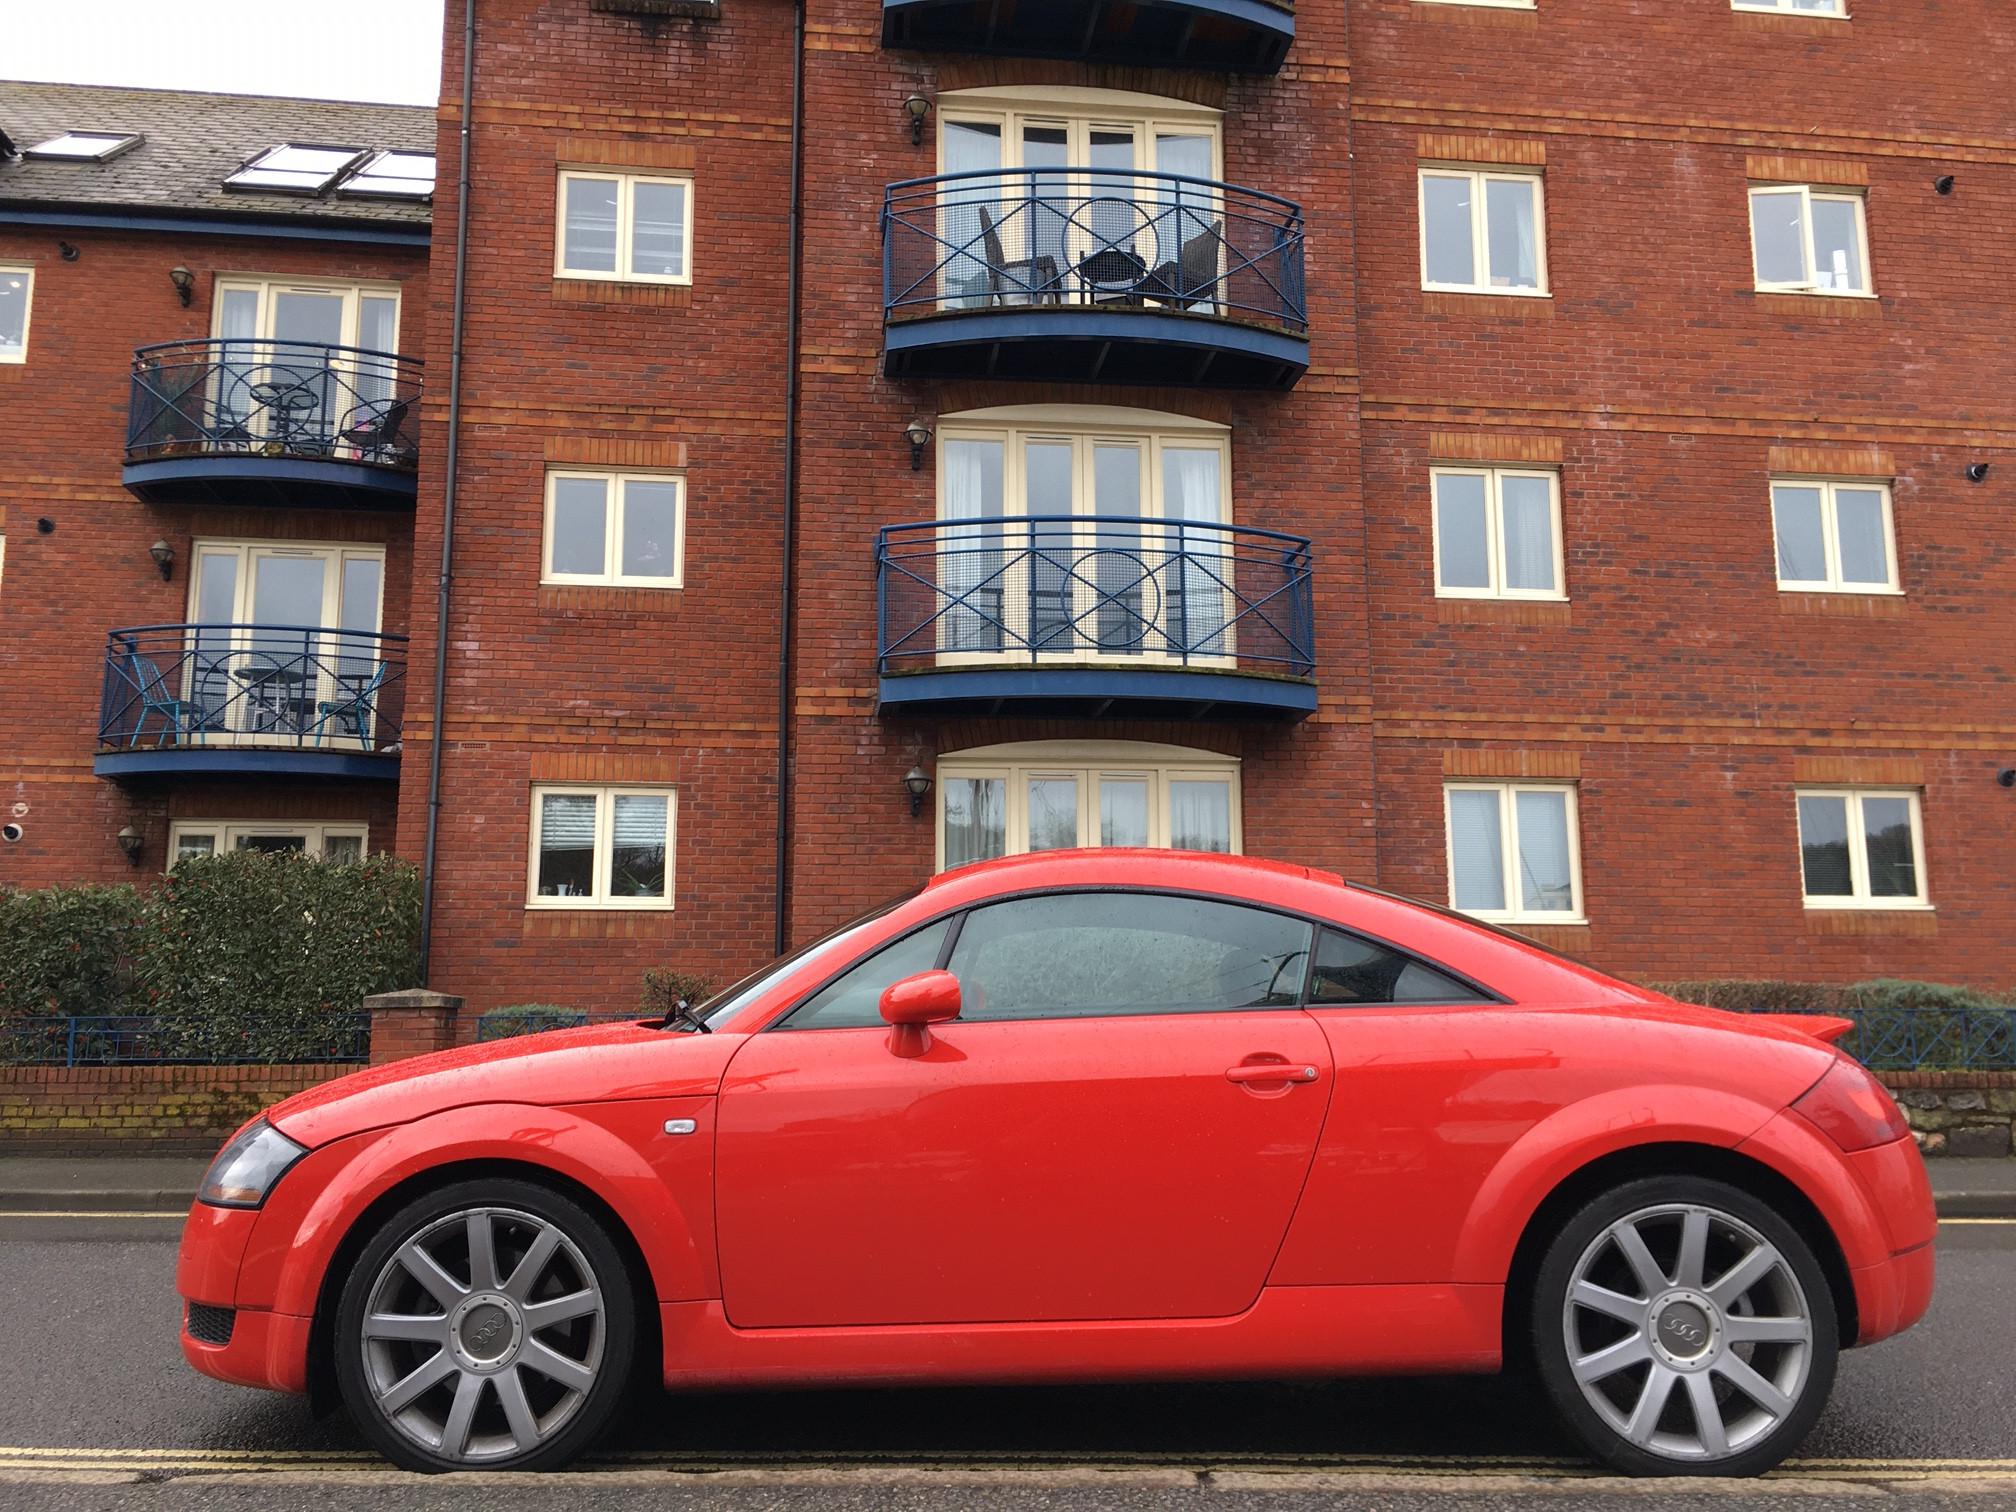 Audi Tt Hire Exeter